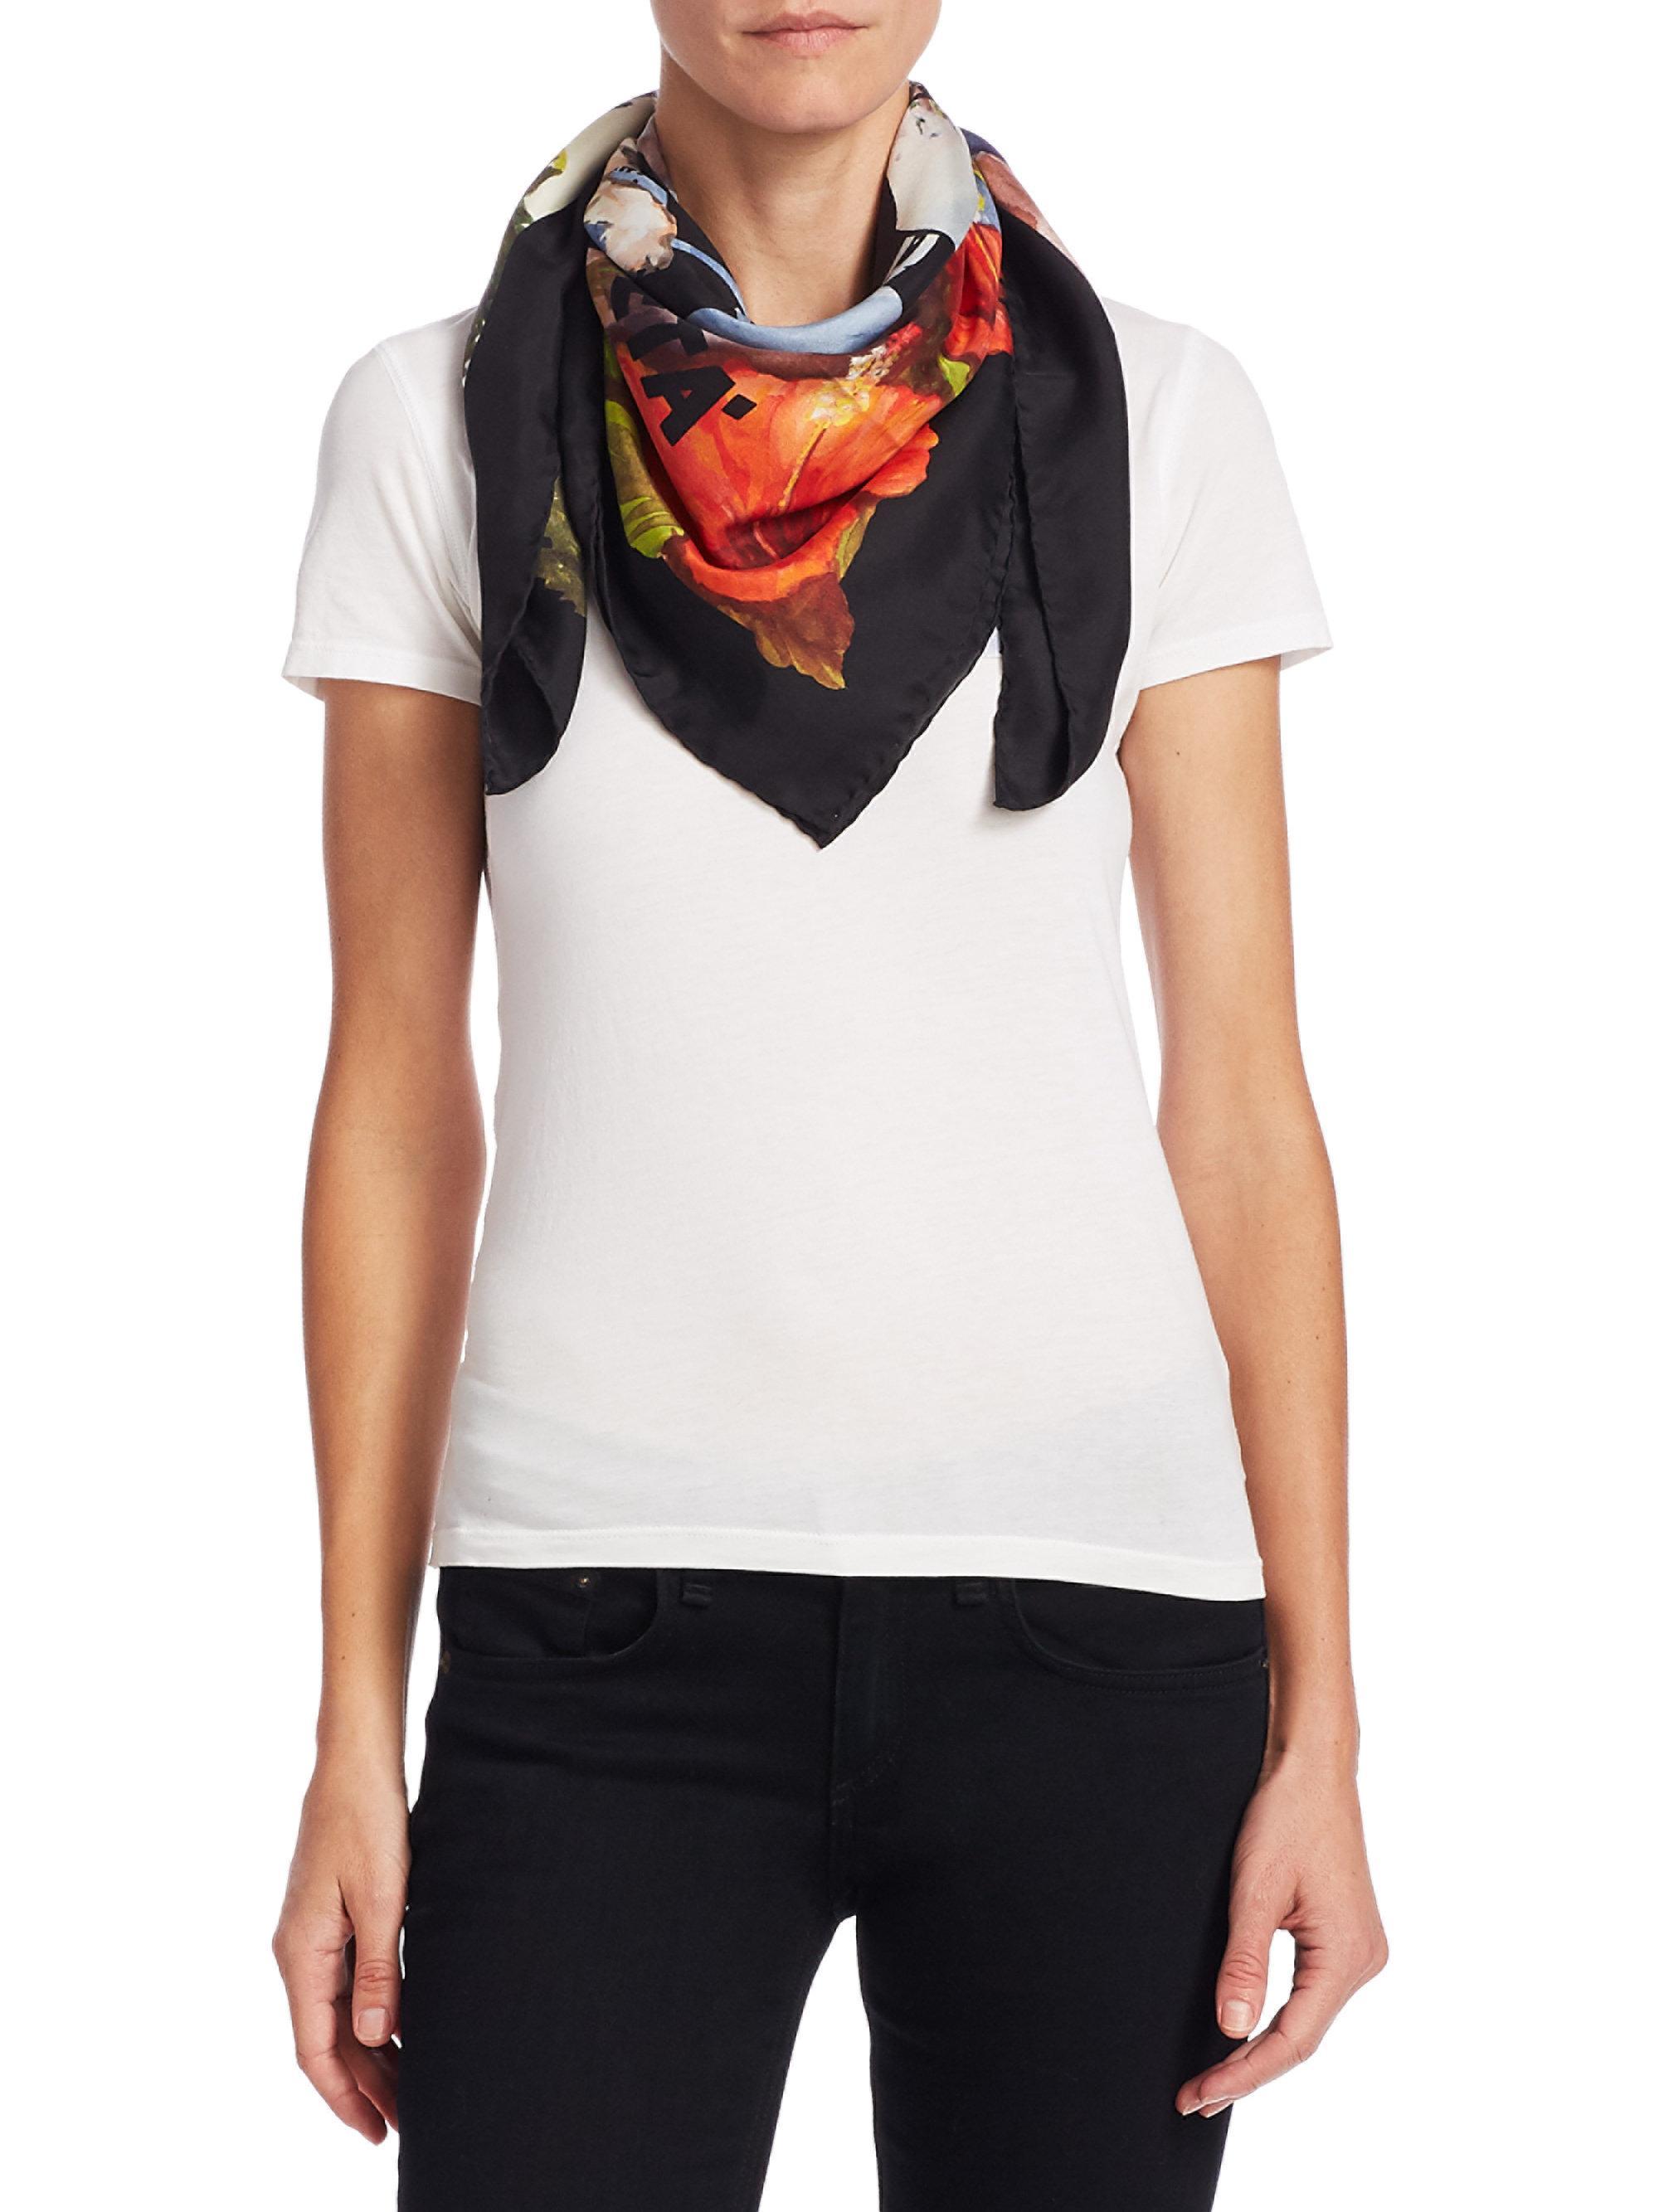 Guccify Yourself print silk scarf - Black Gucci 97Dipq